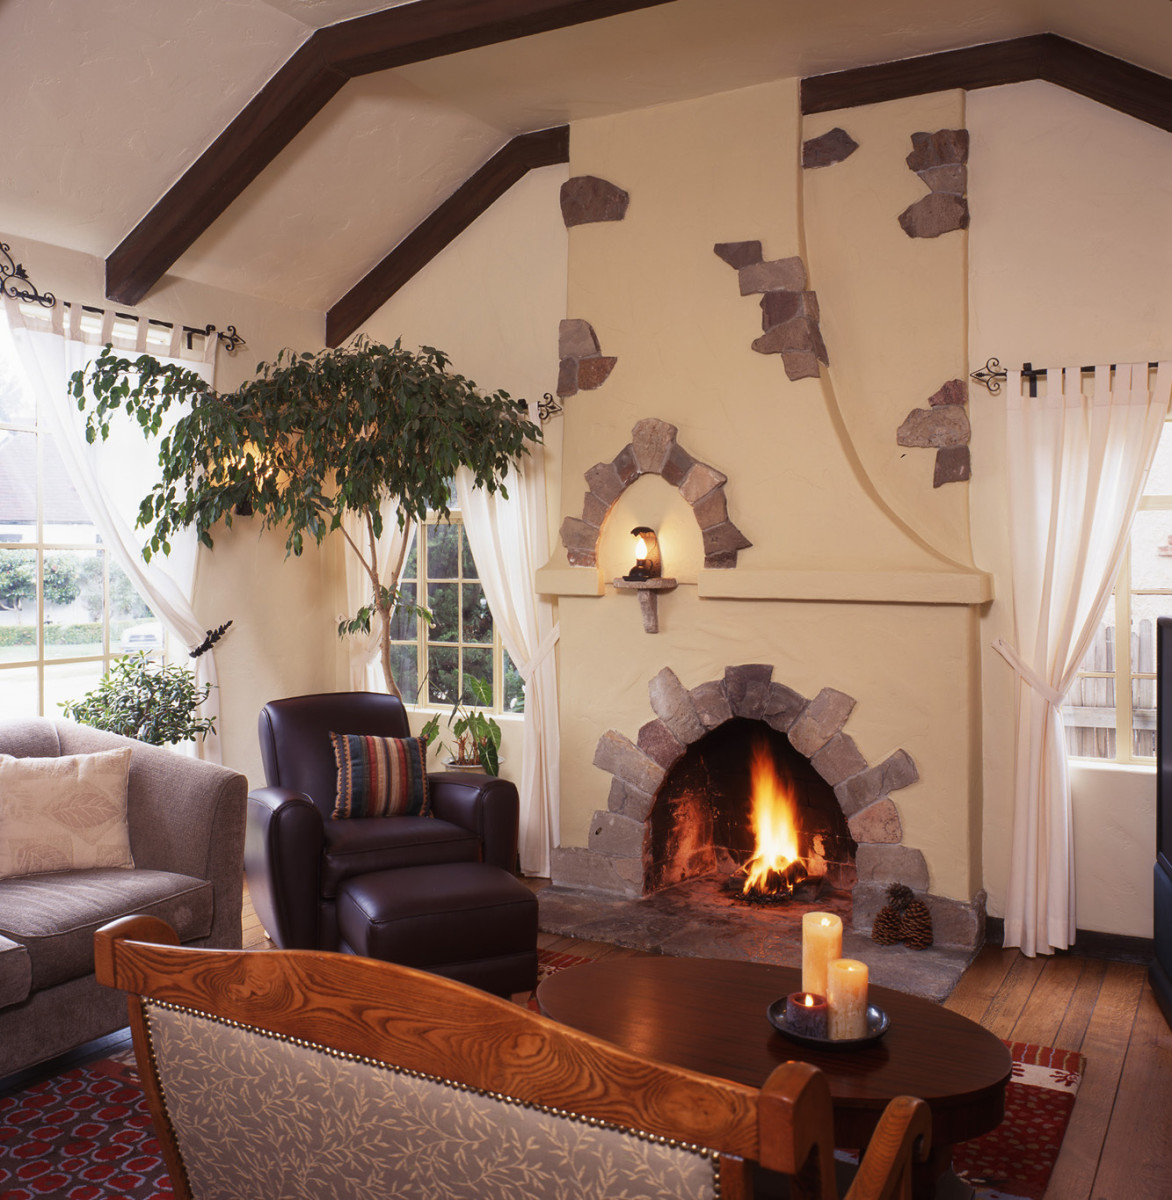 Storybook interior W.W. Dixon